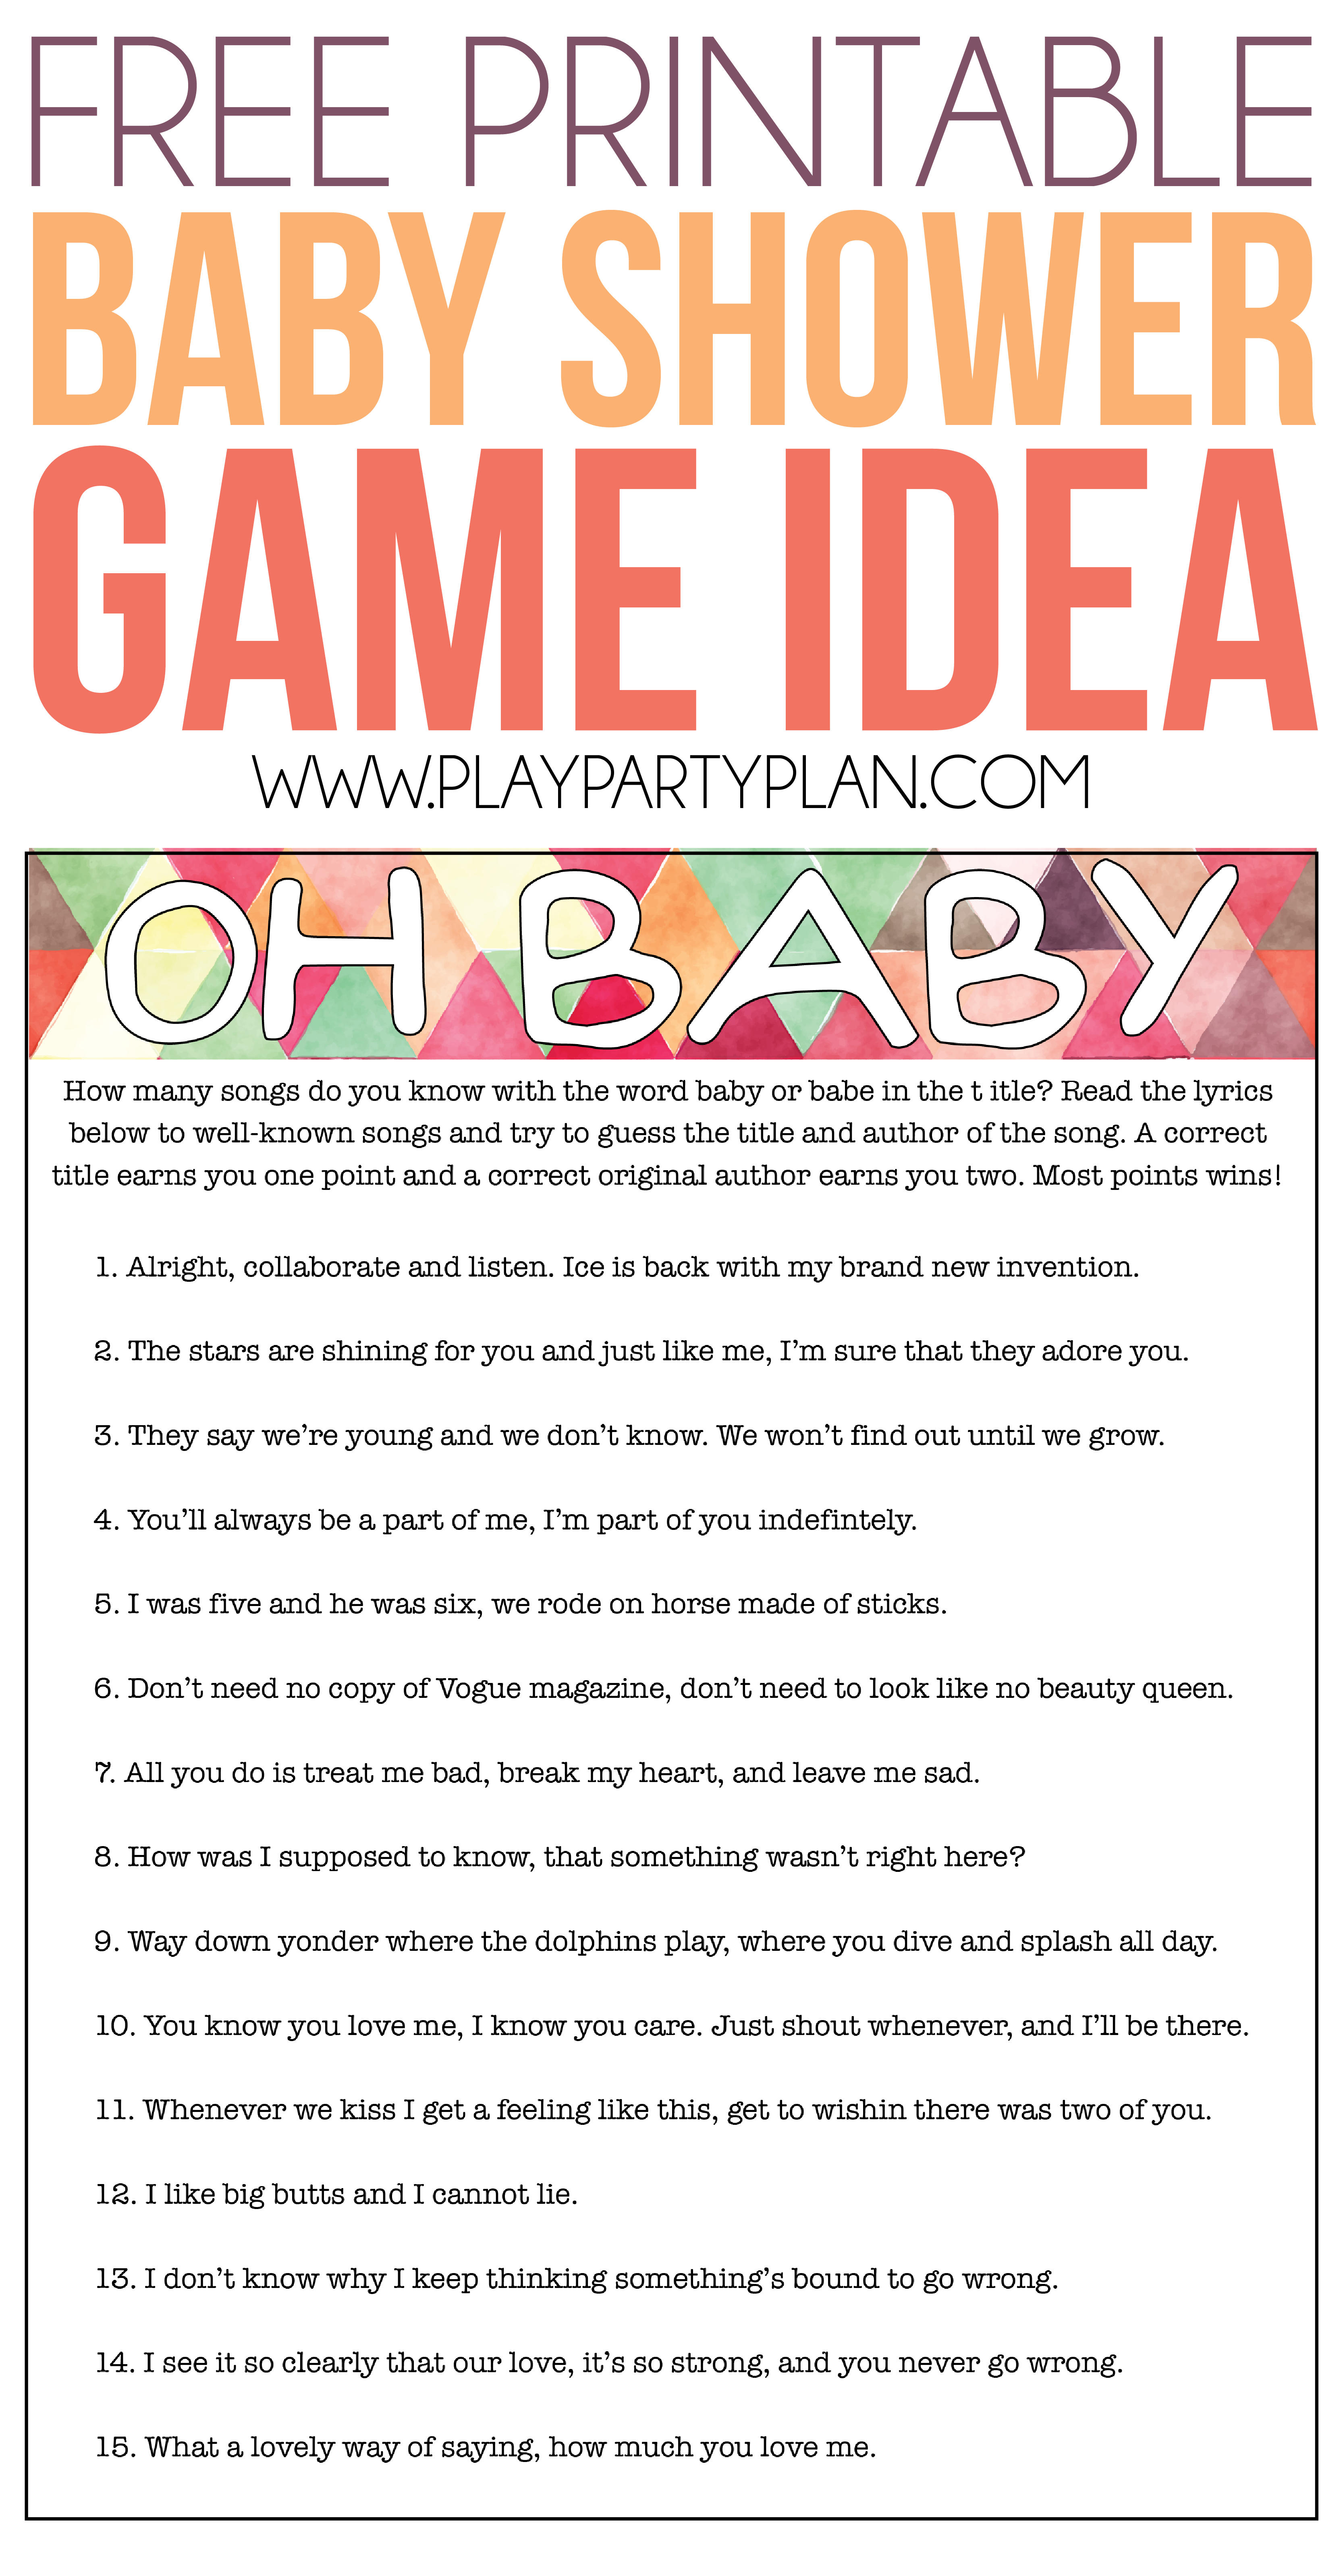 Free Printable Baby Shower Game That Has Guests Guess The Name Of - Name That Tune Baby Shower Game Free Printable